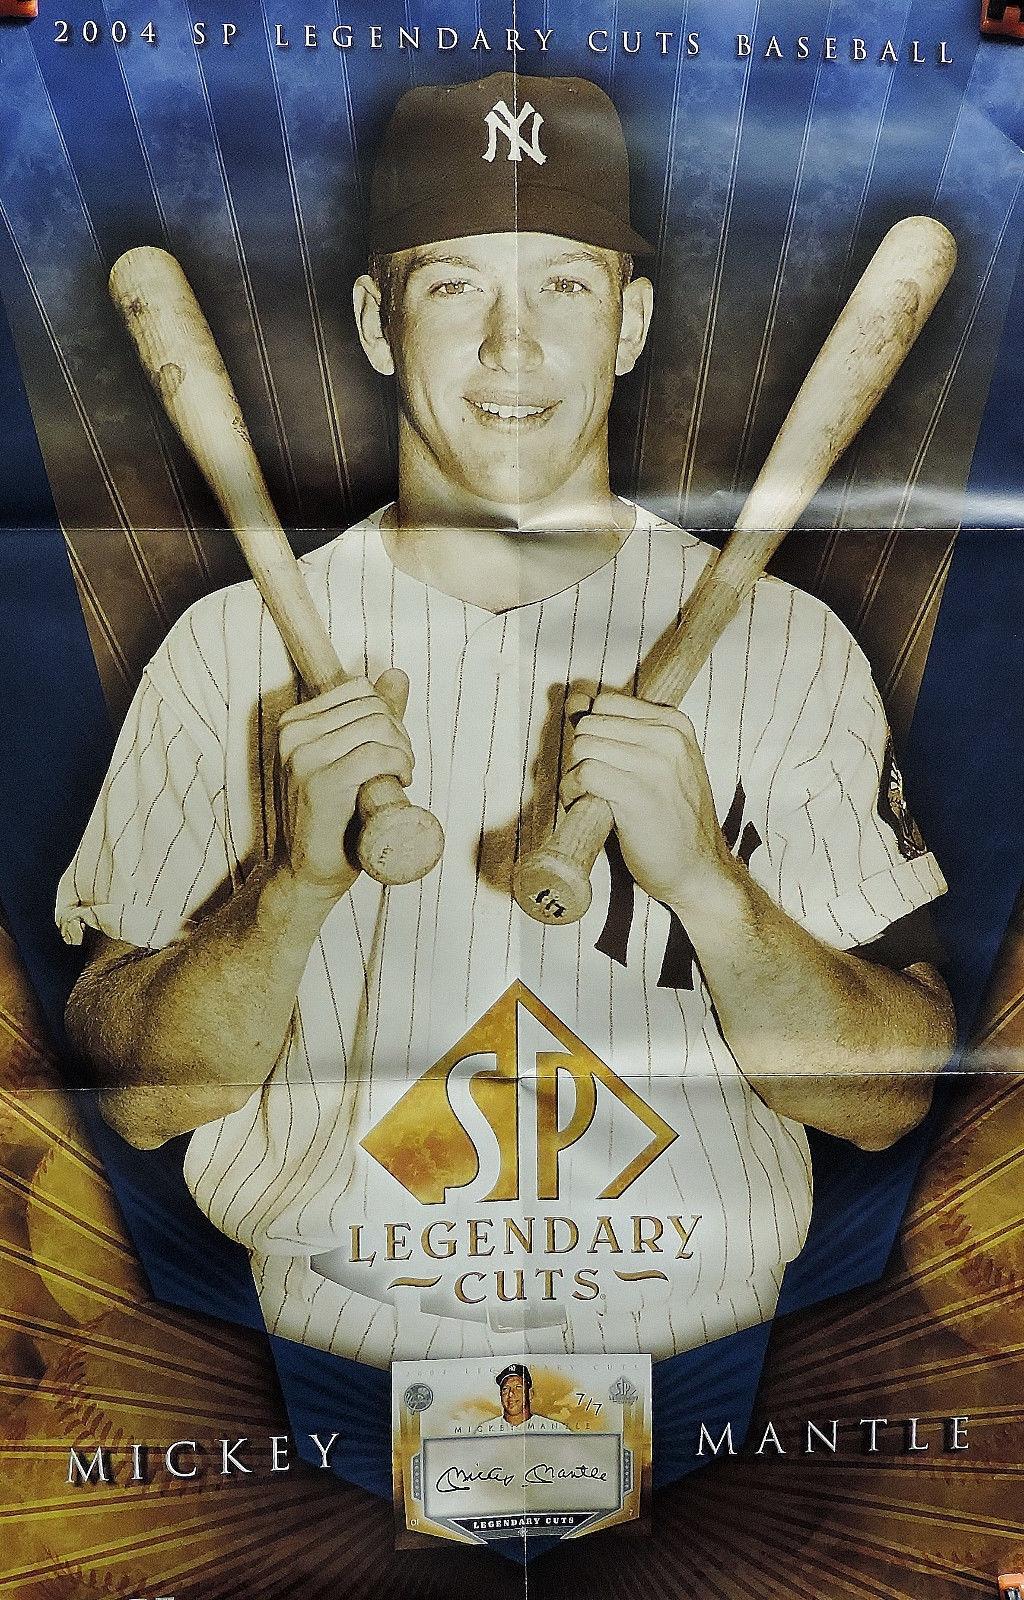 2004 SP legendary cuts